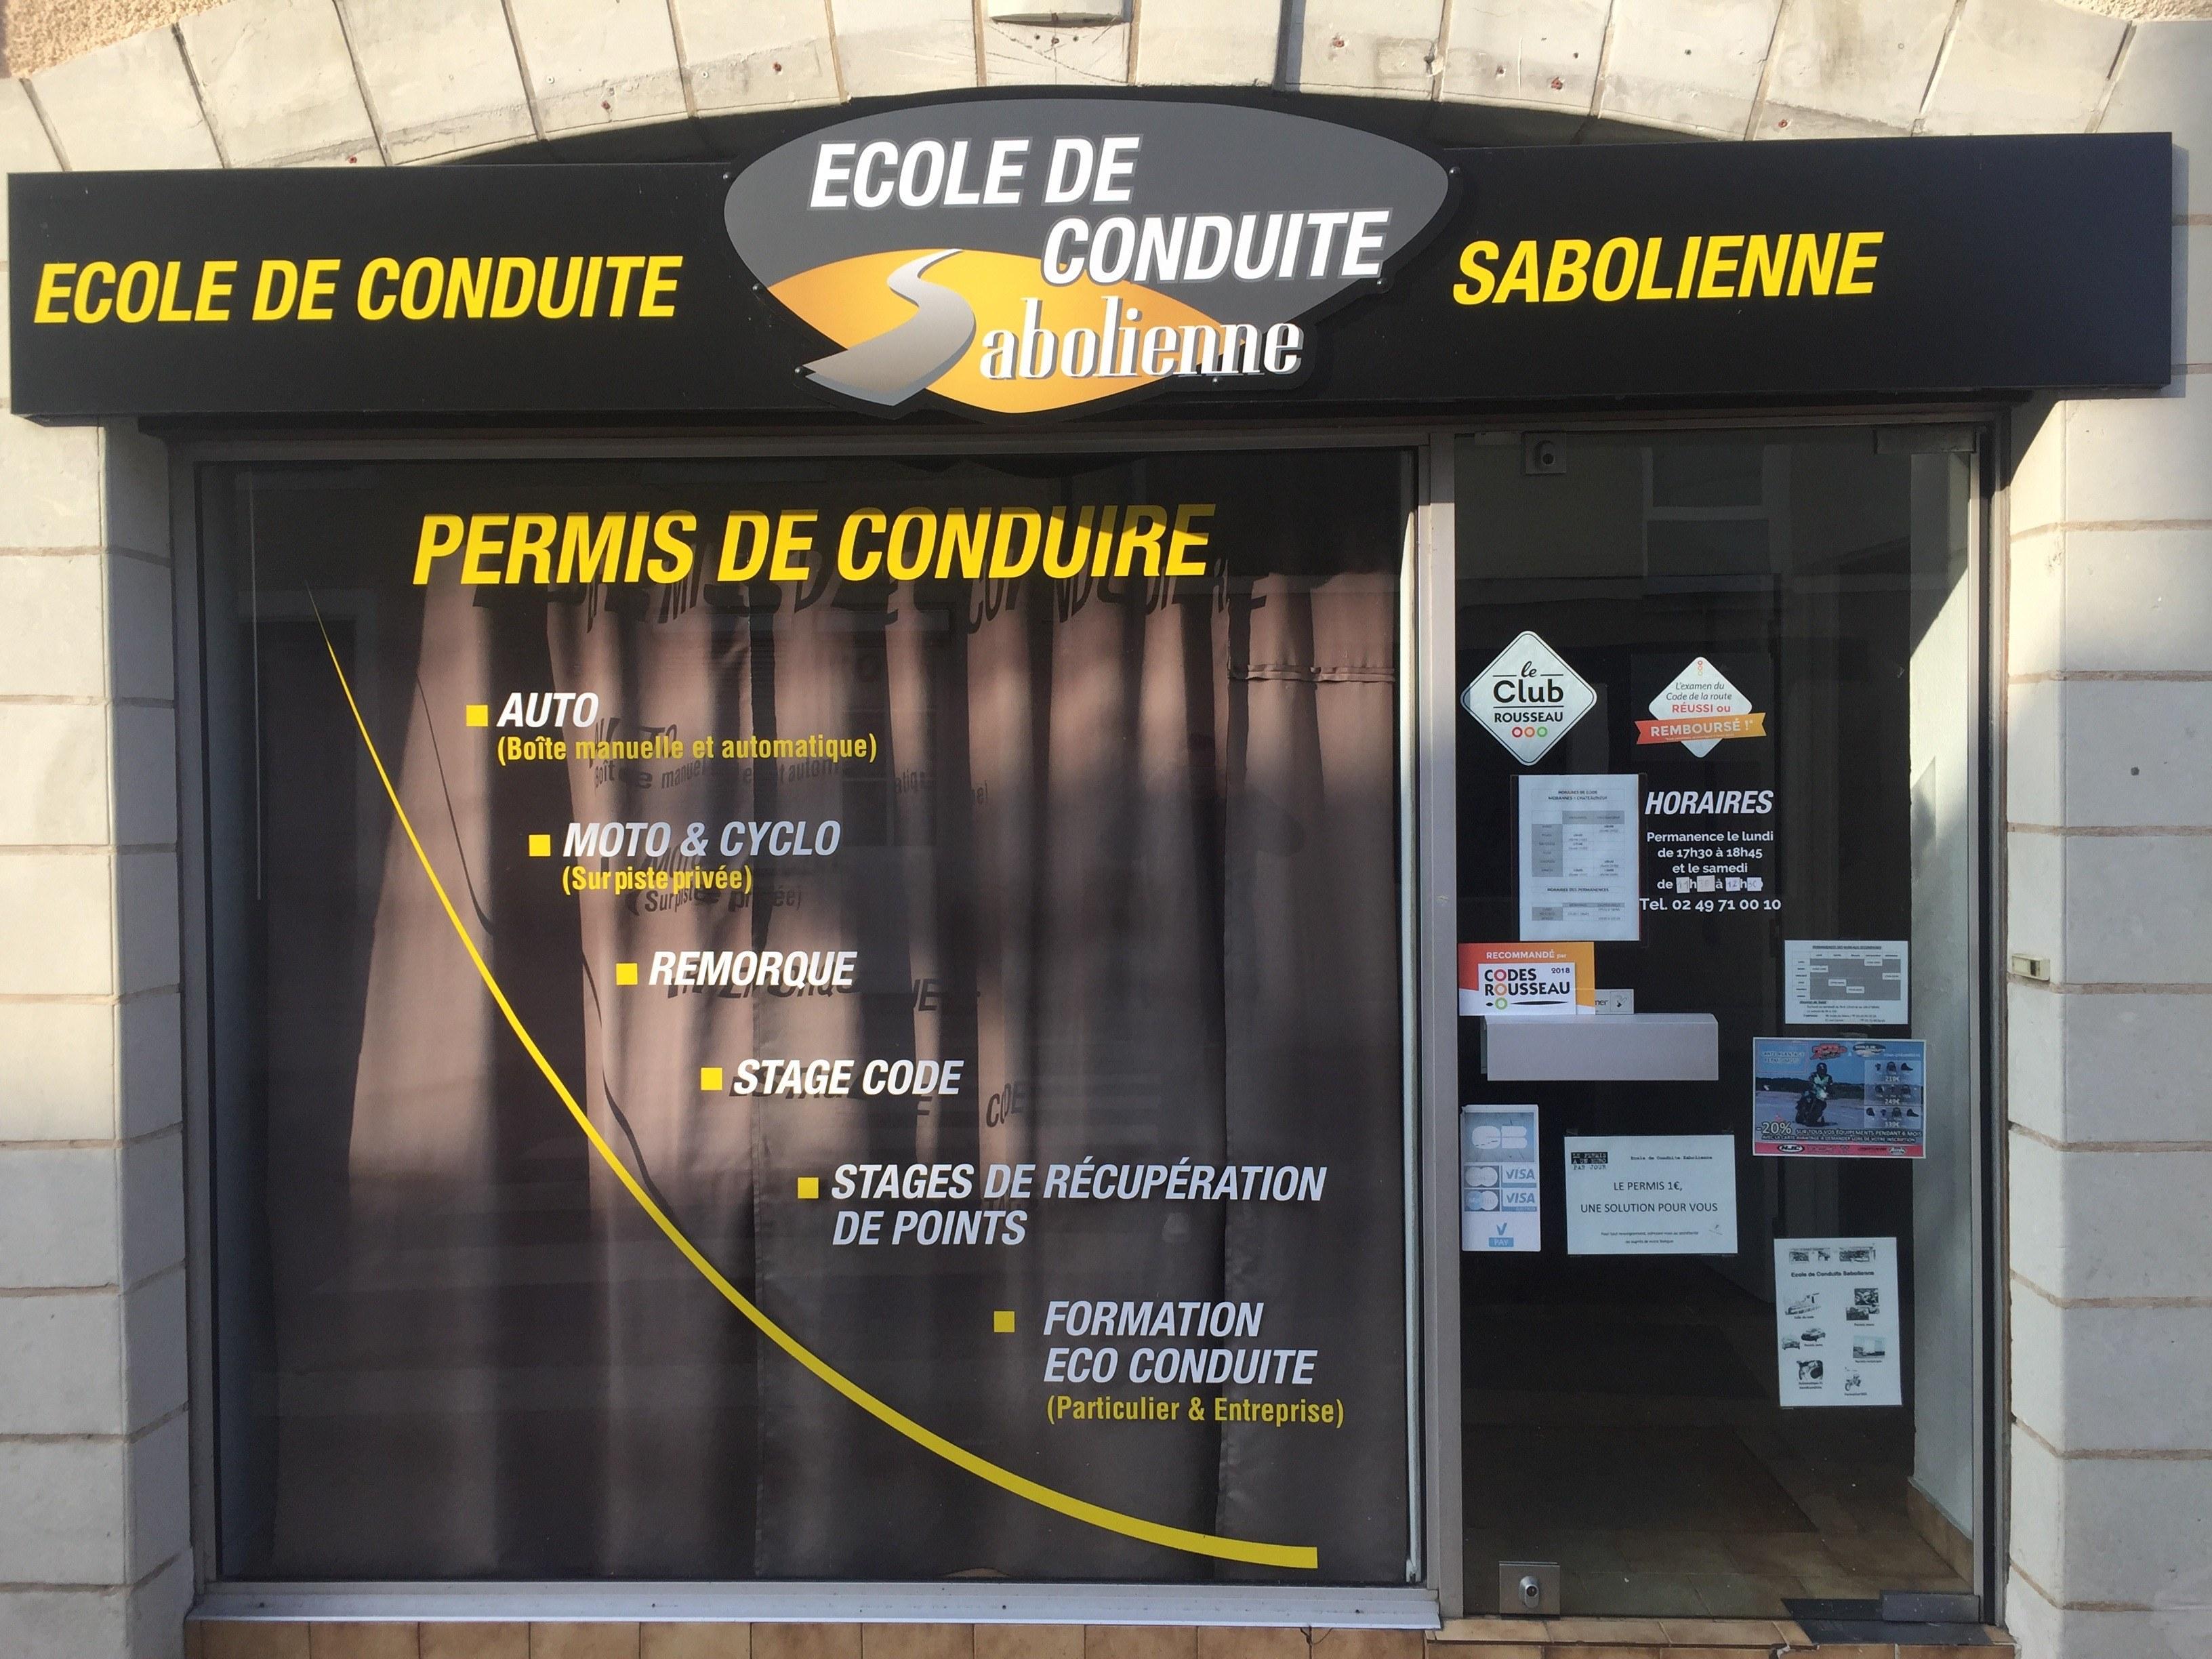 Ecole de conduite Sabolienne - Morannes